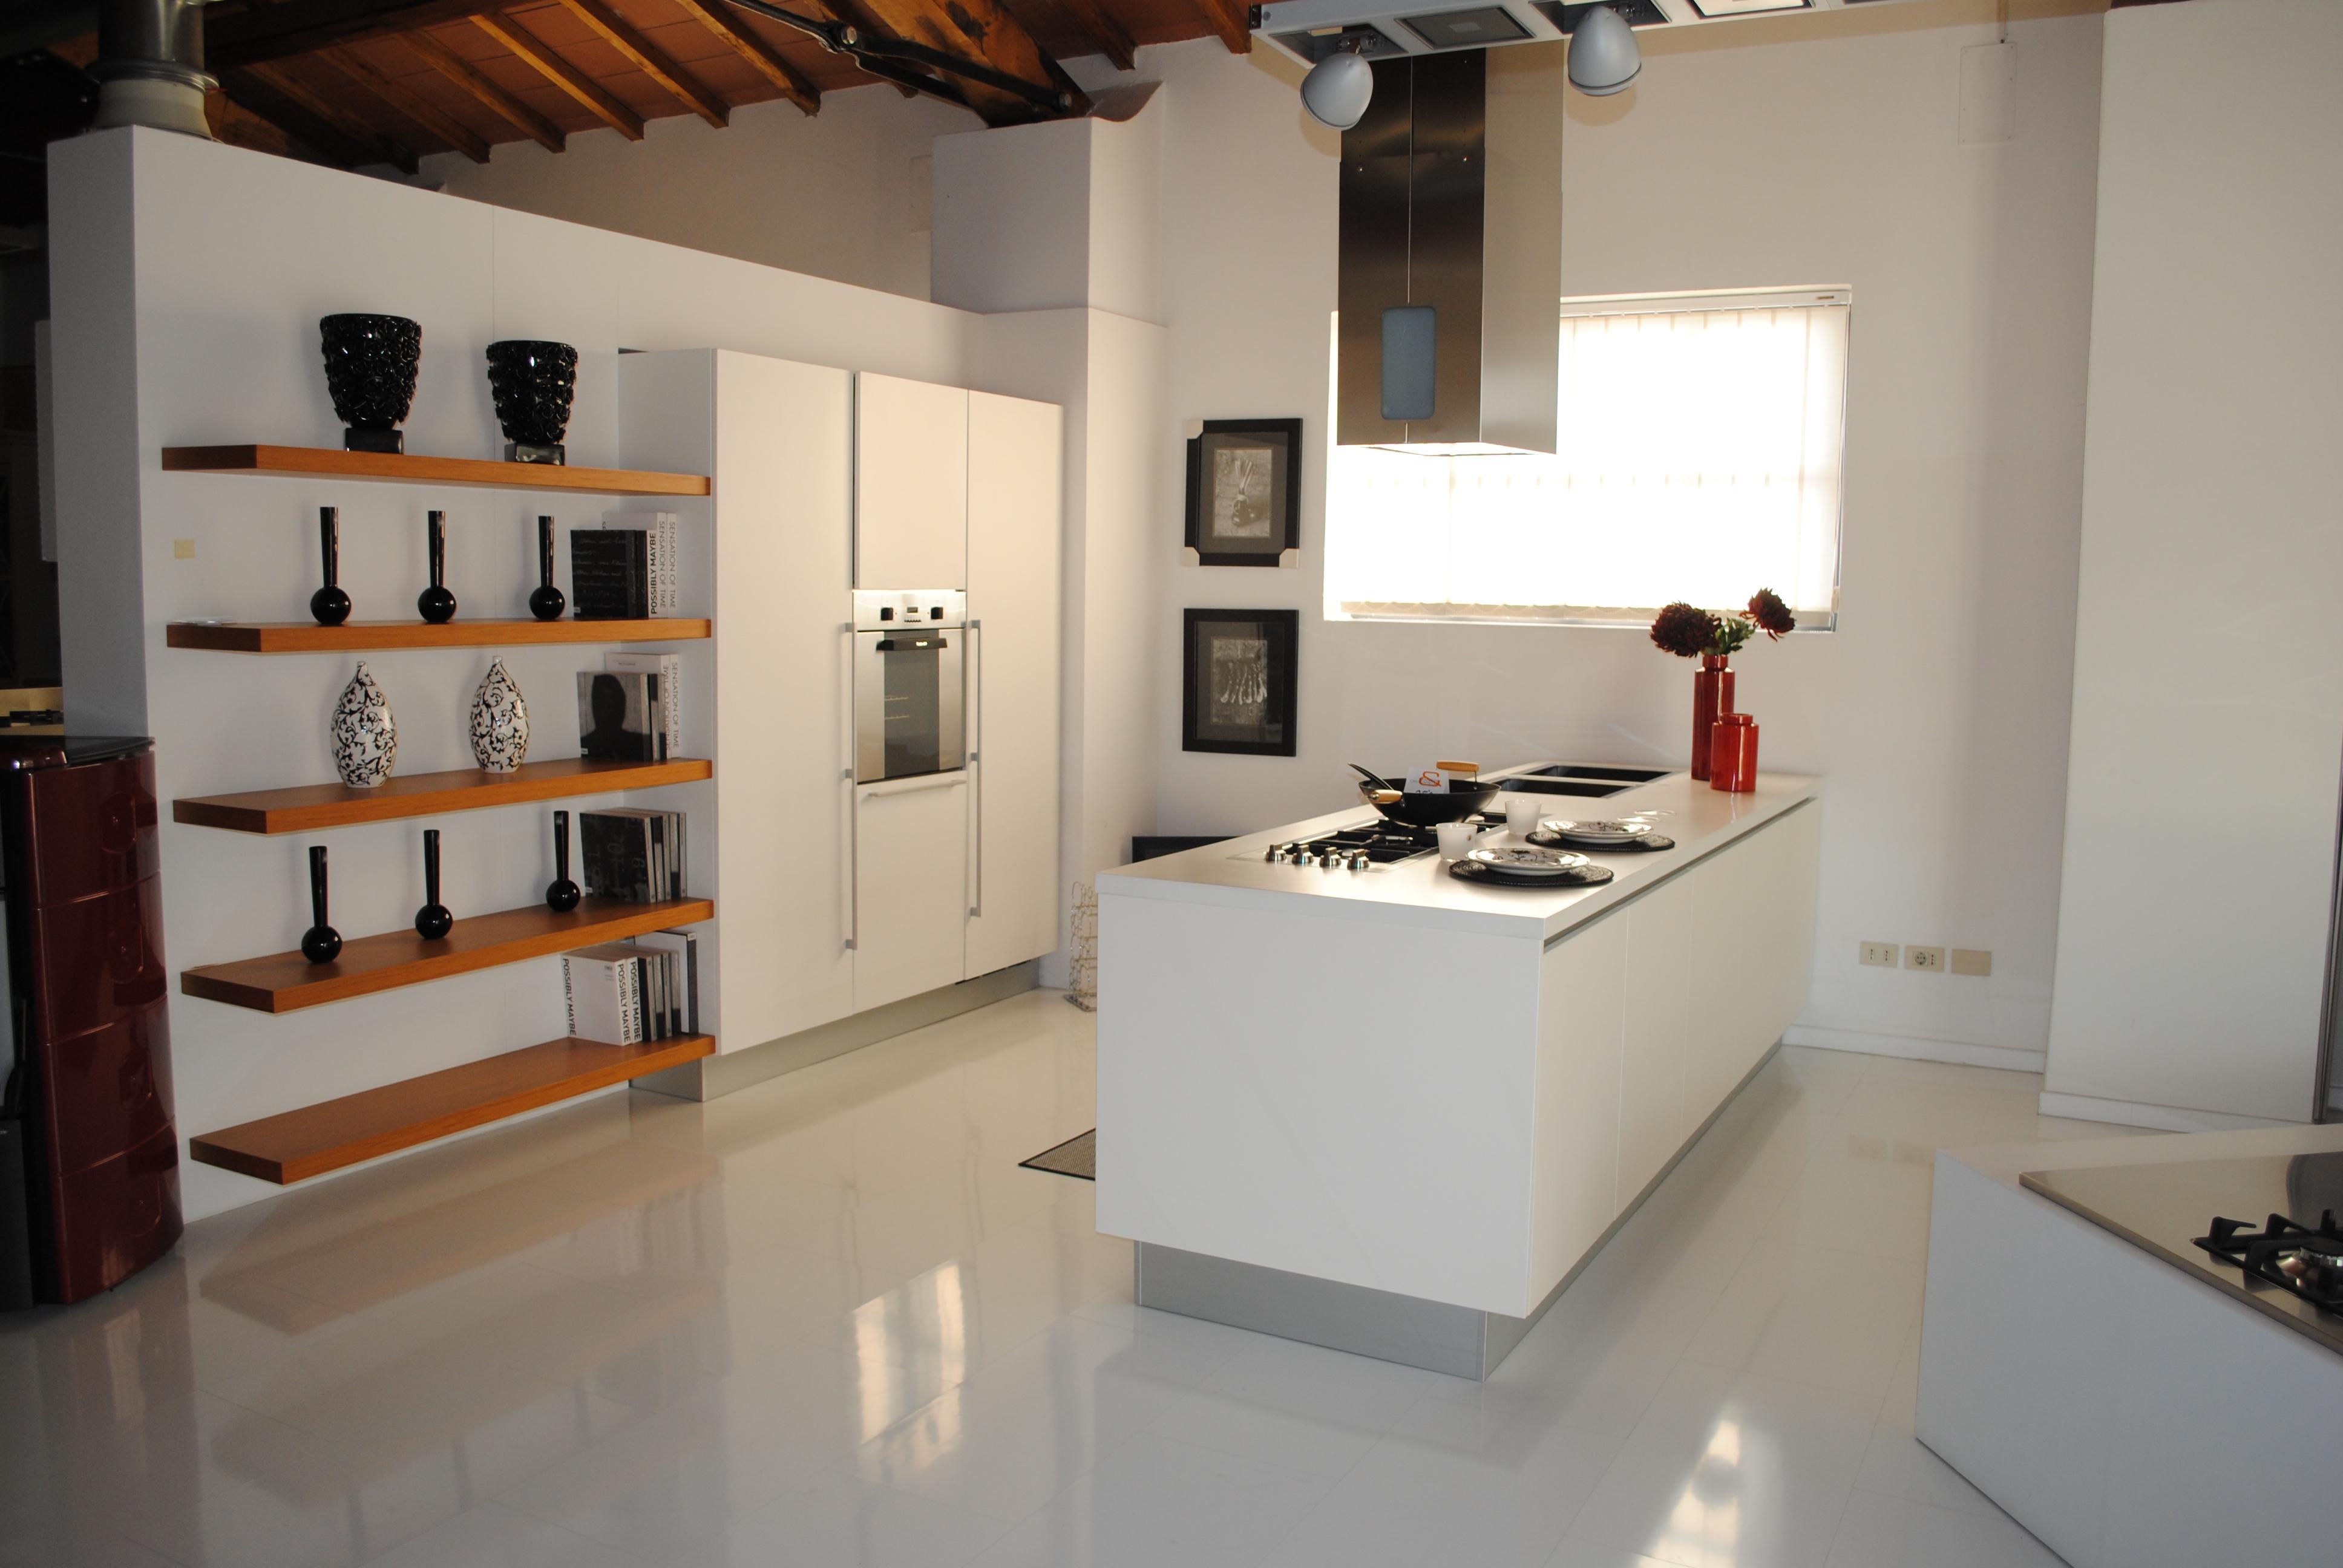 Cucine In Offerta Roma. Cucina Angolare With Cucine In Offerta Roma. Top Cucine Componibili ...